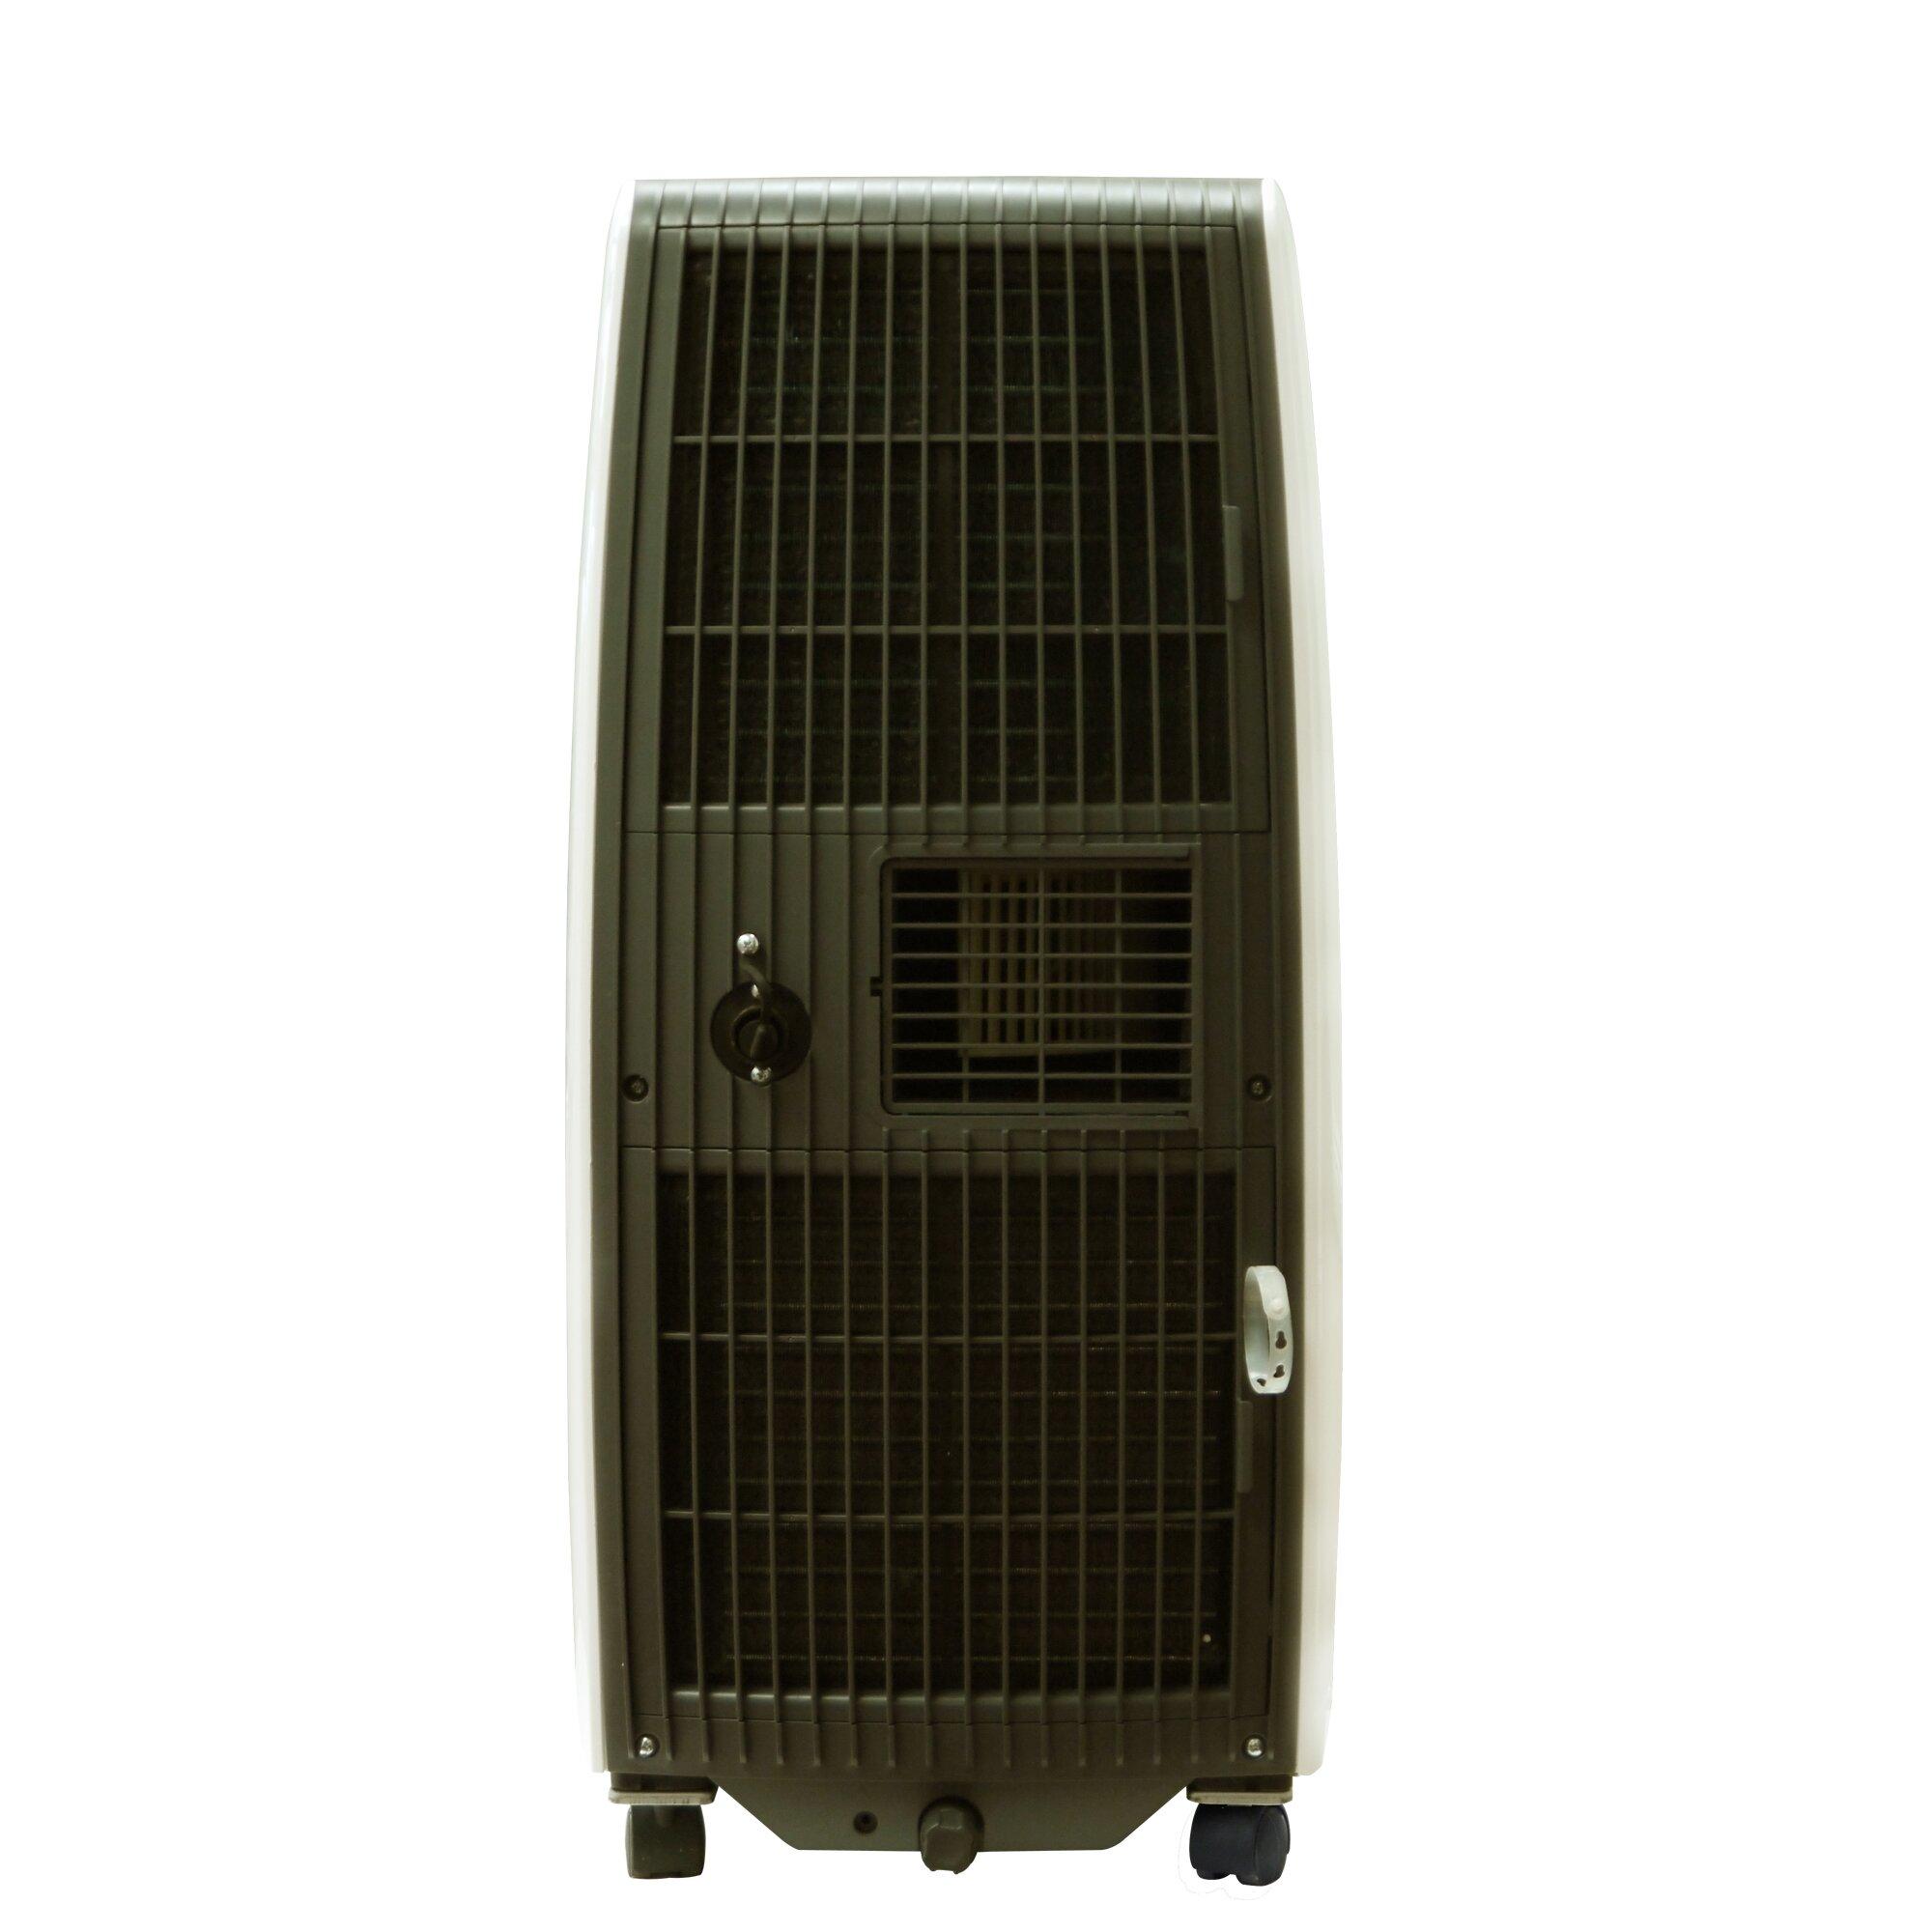 Sunpentown Portable Air Conditioner & Reviews Wayfair Supply #252214